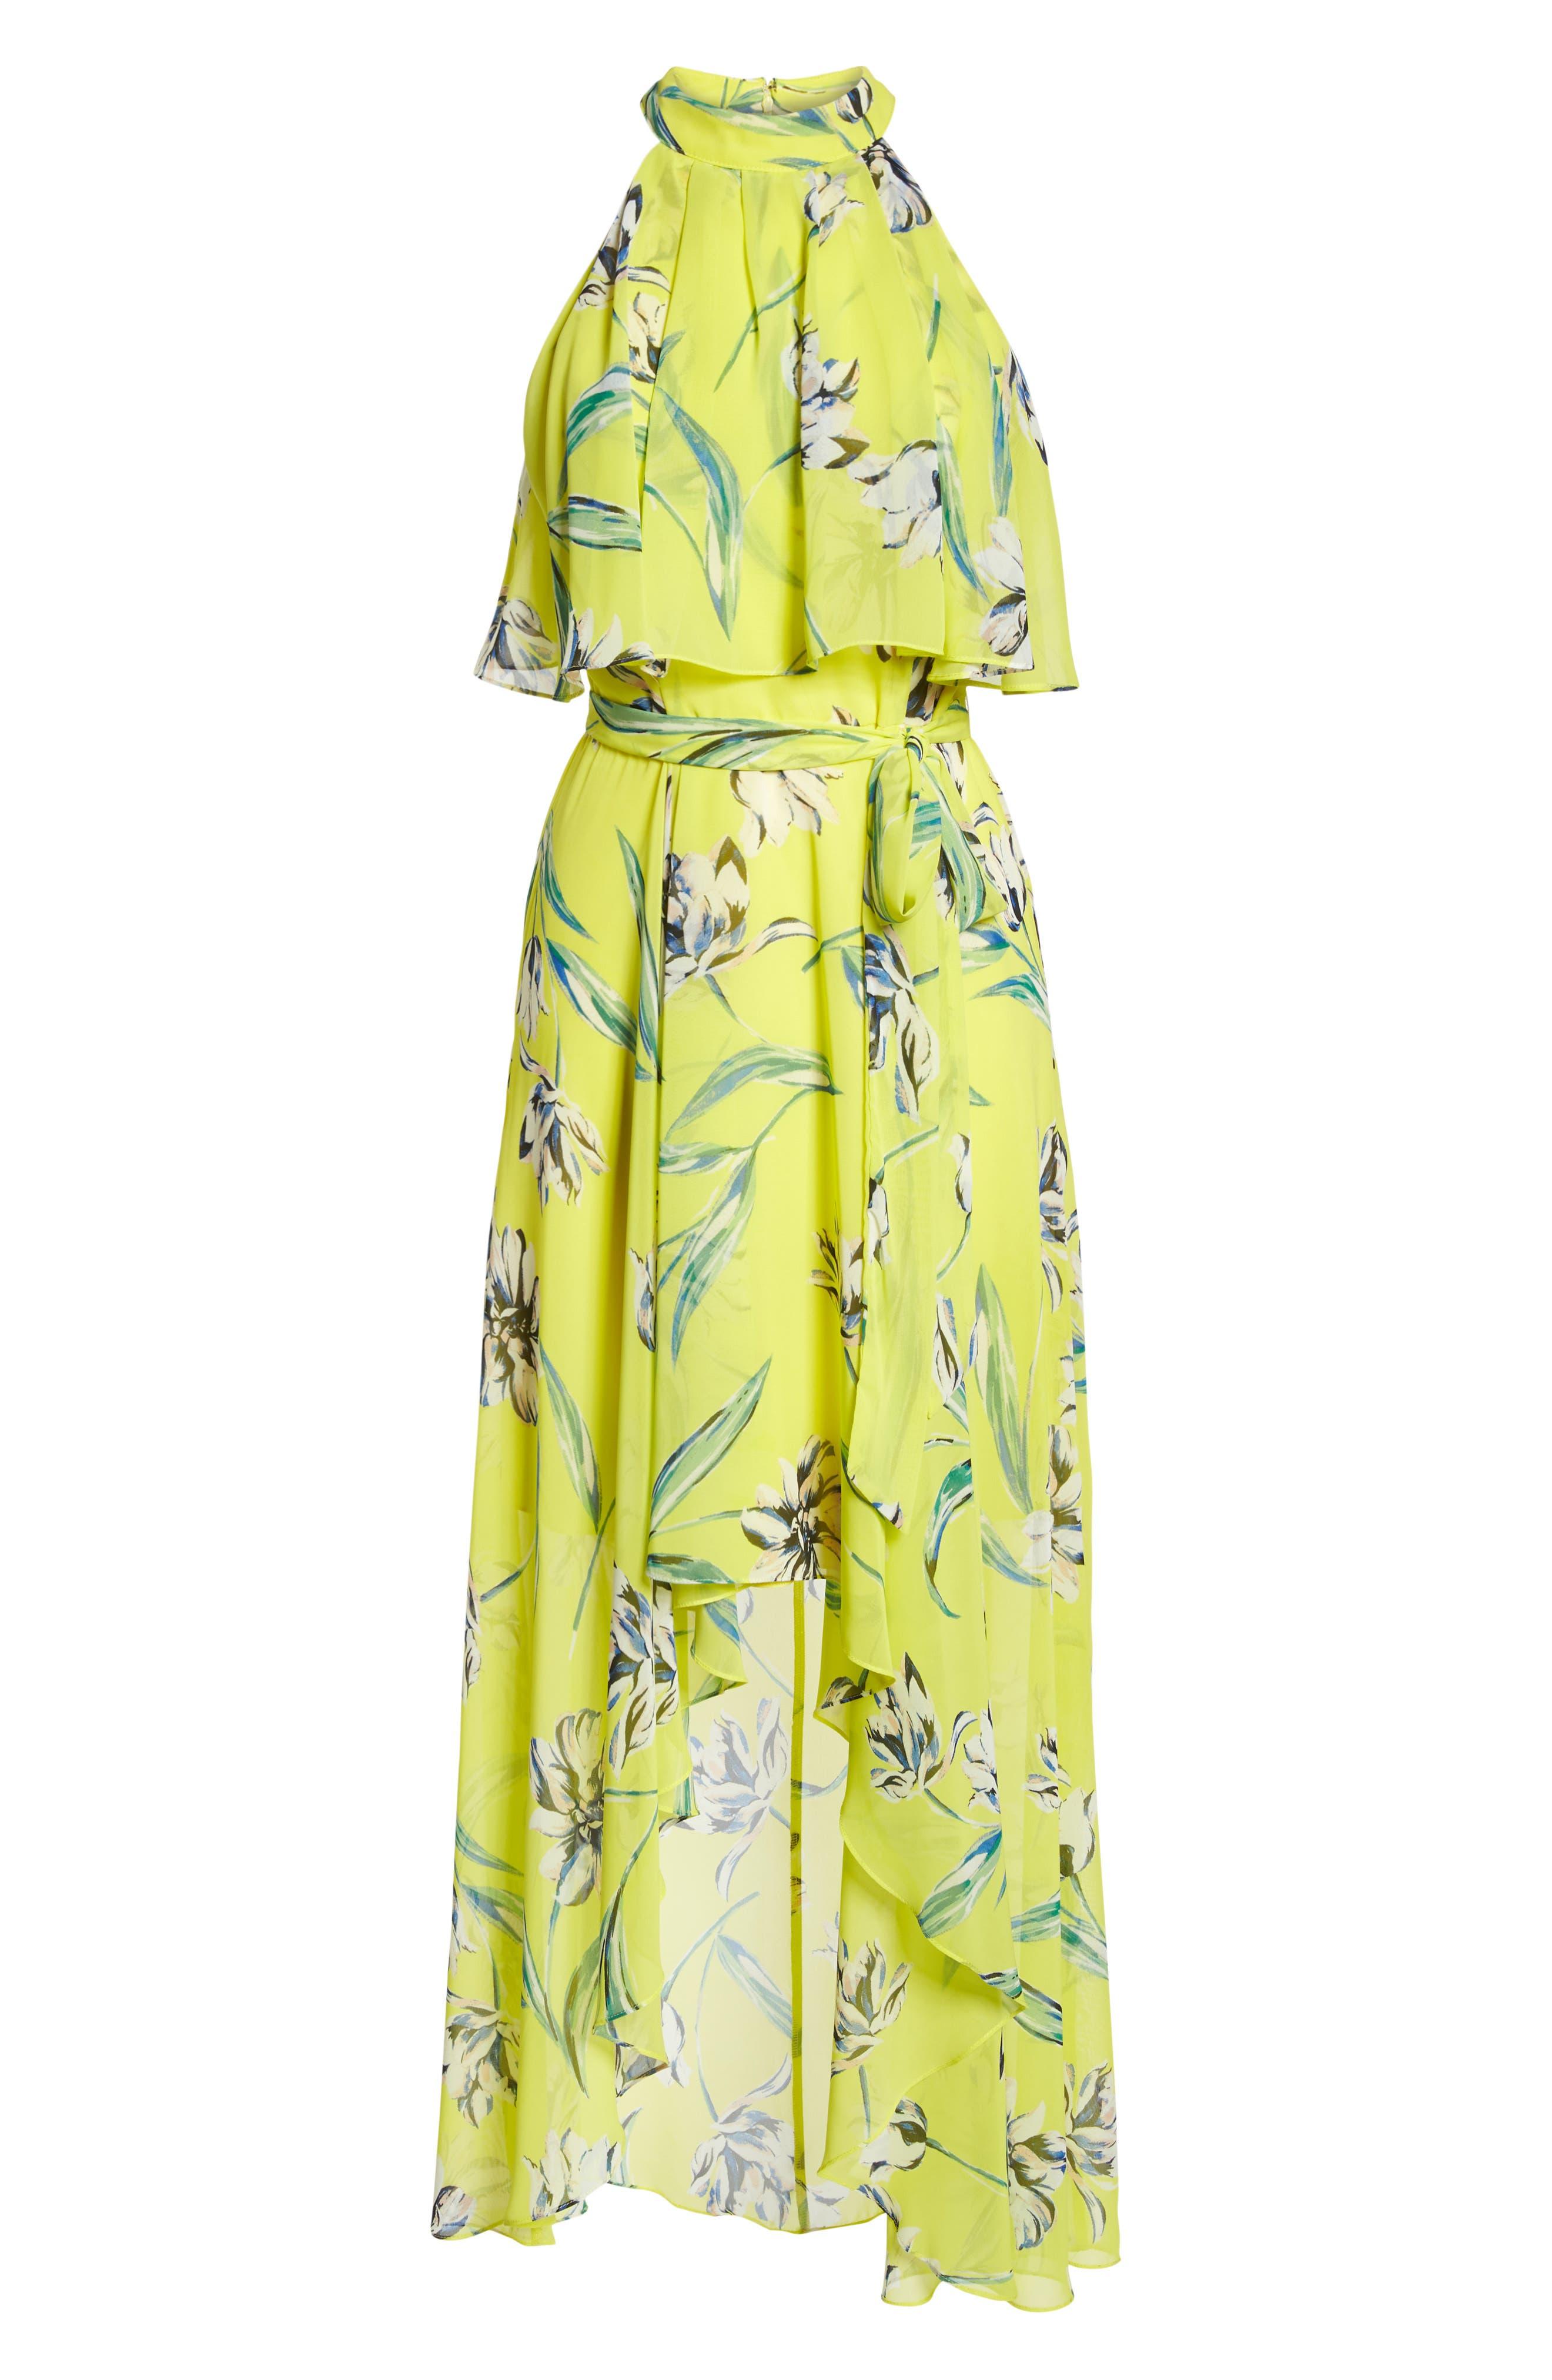 Halter Neck Chiffon Maxi Dress,                             Alternate thumbnail 7, color,                             Yellow